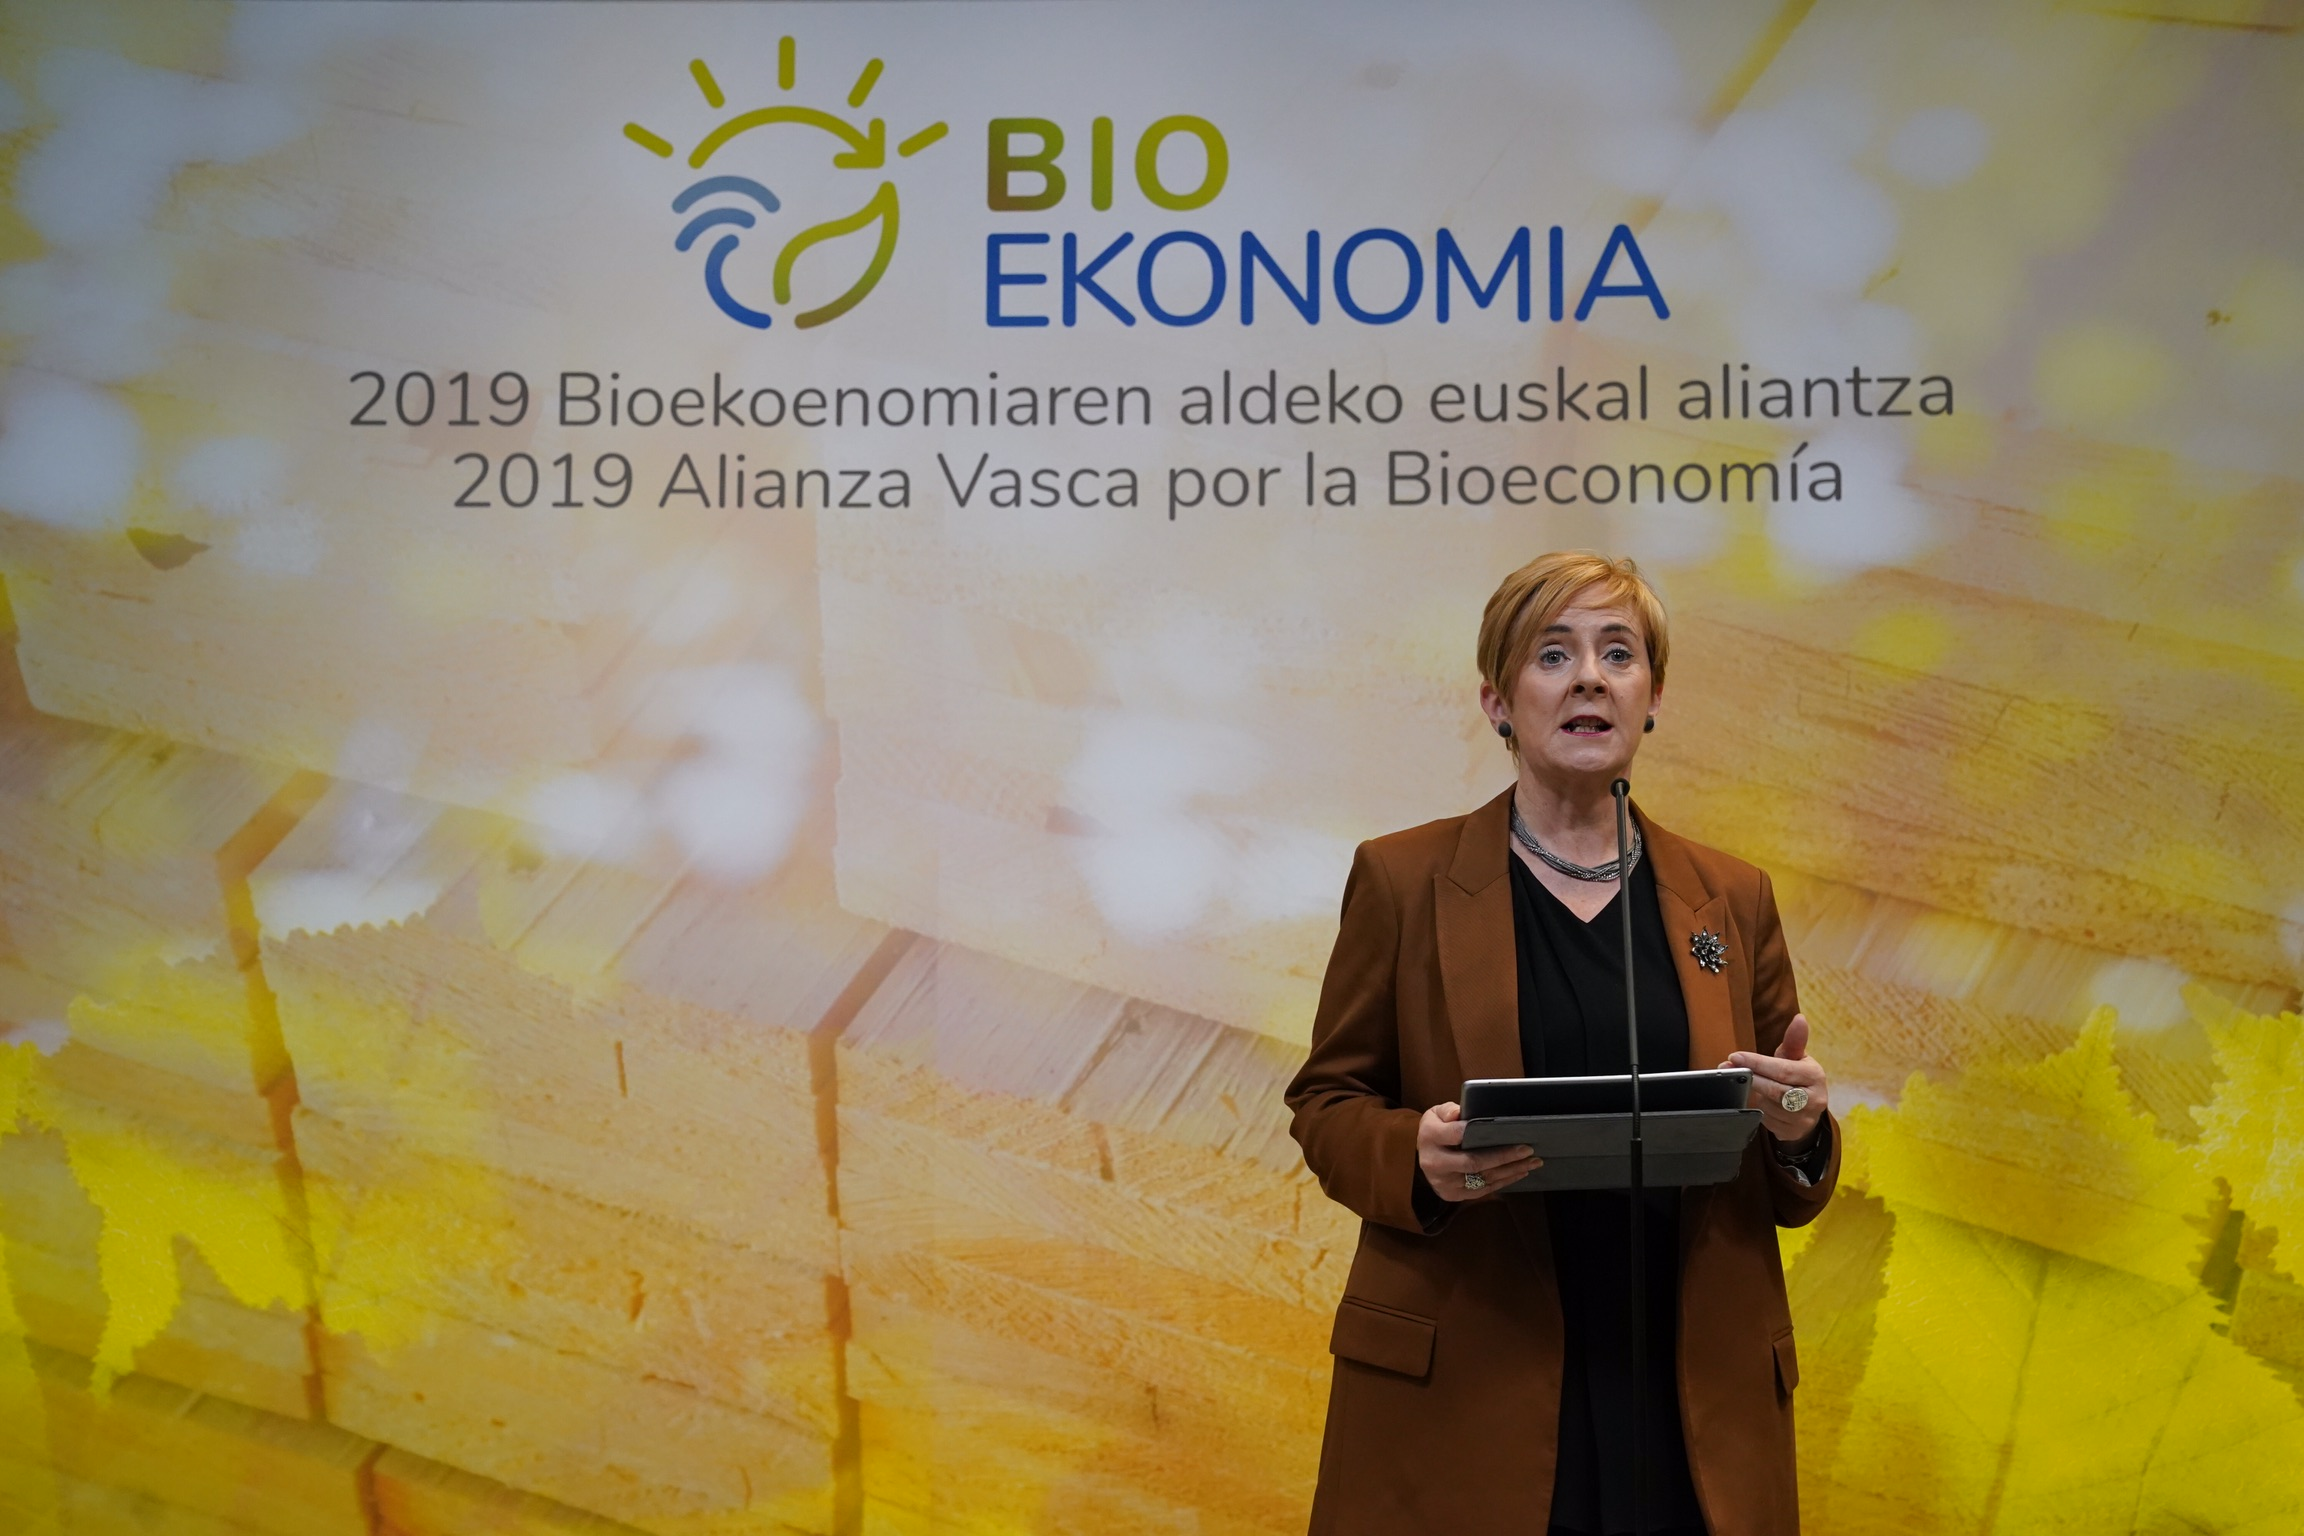 Tapia_Bioekonomia_4.jpeg